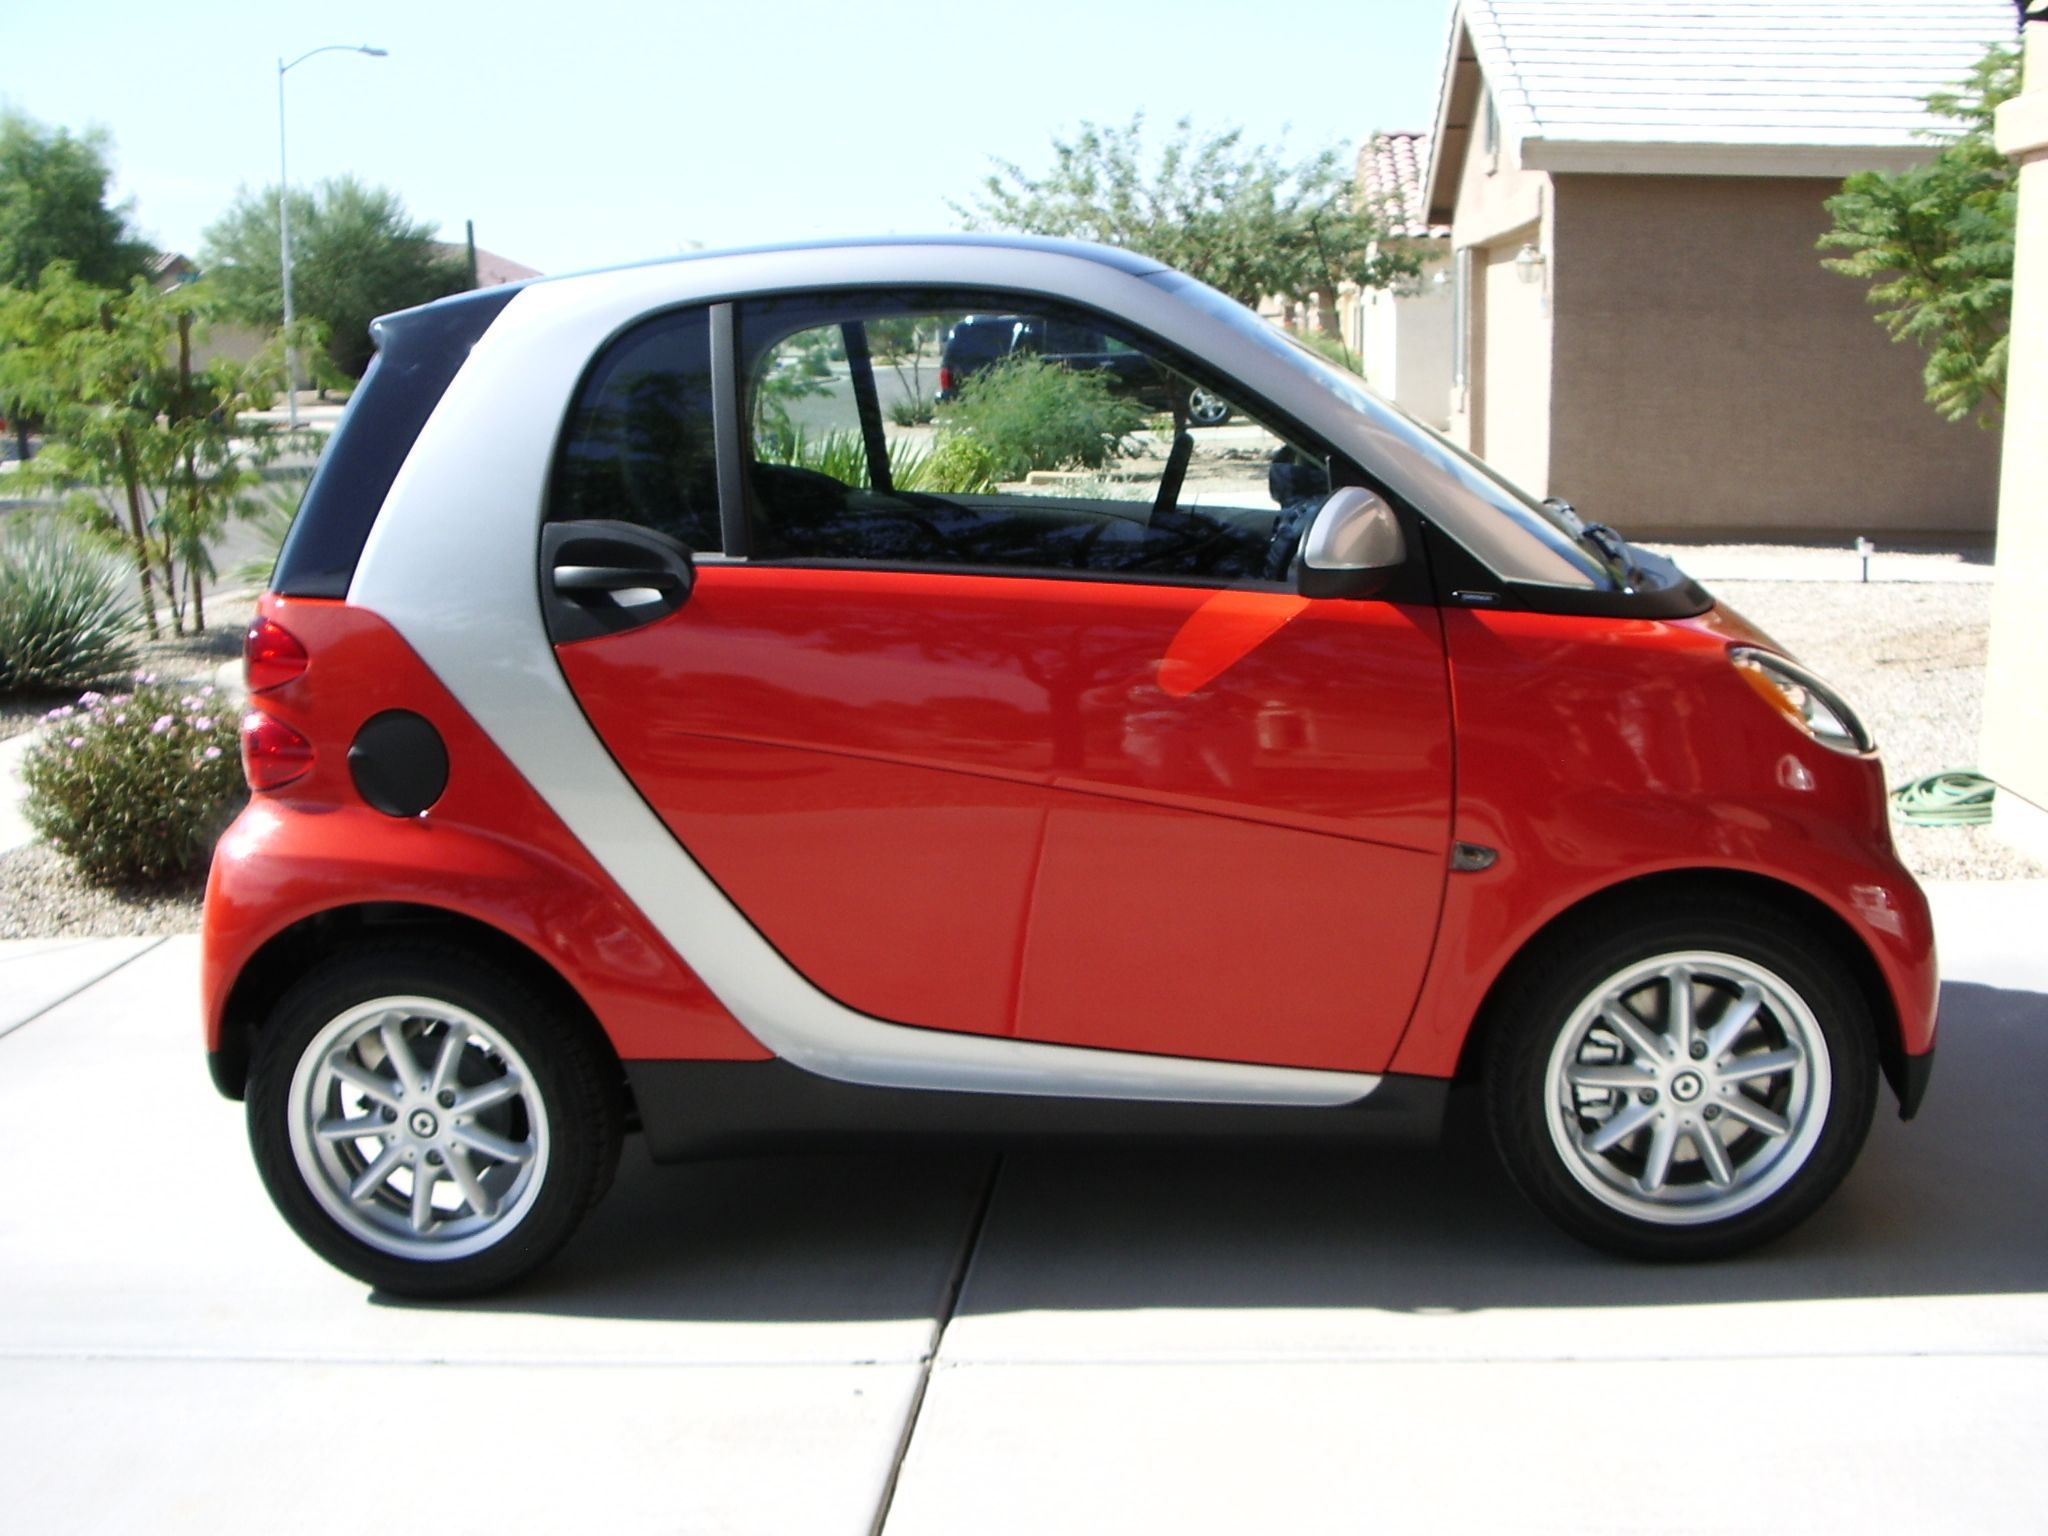 Smart Car Price Comparison Get The Best Deal Smart car